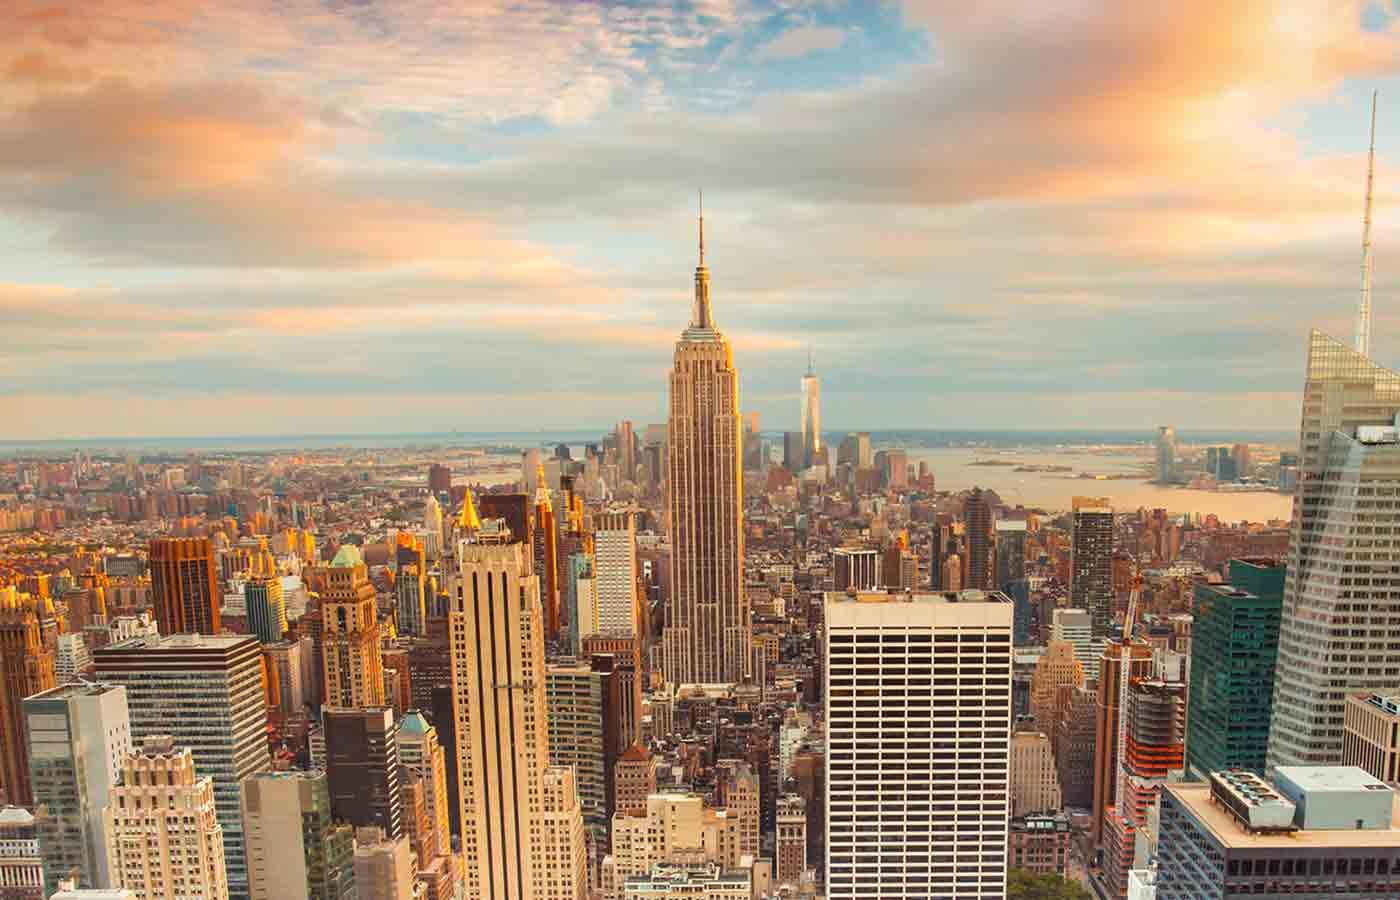 New York City skyline - Strata Data Conference 2018